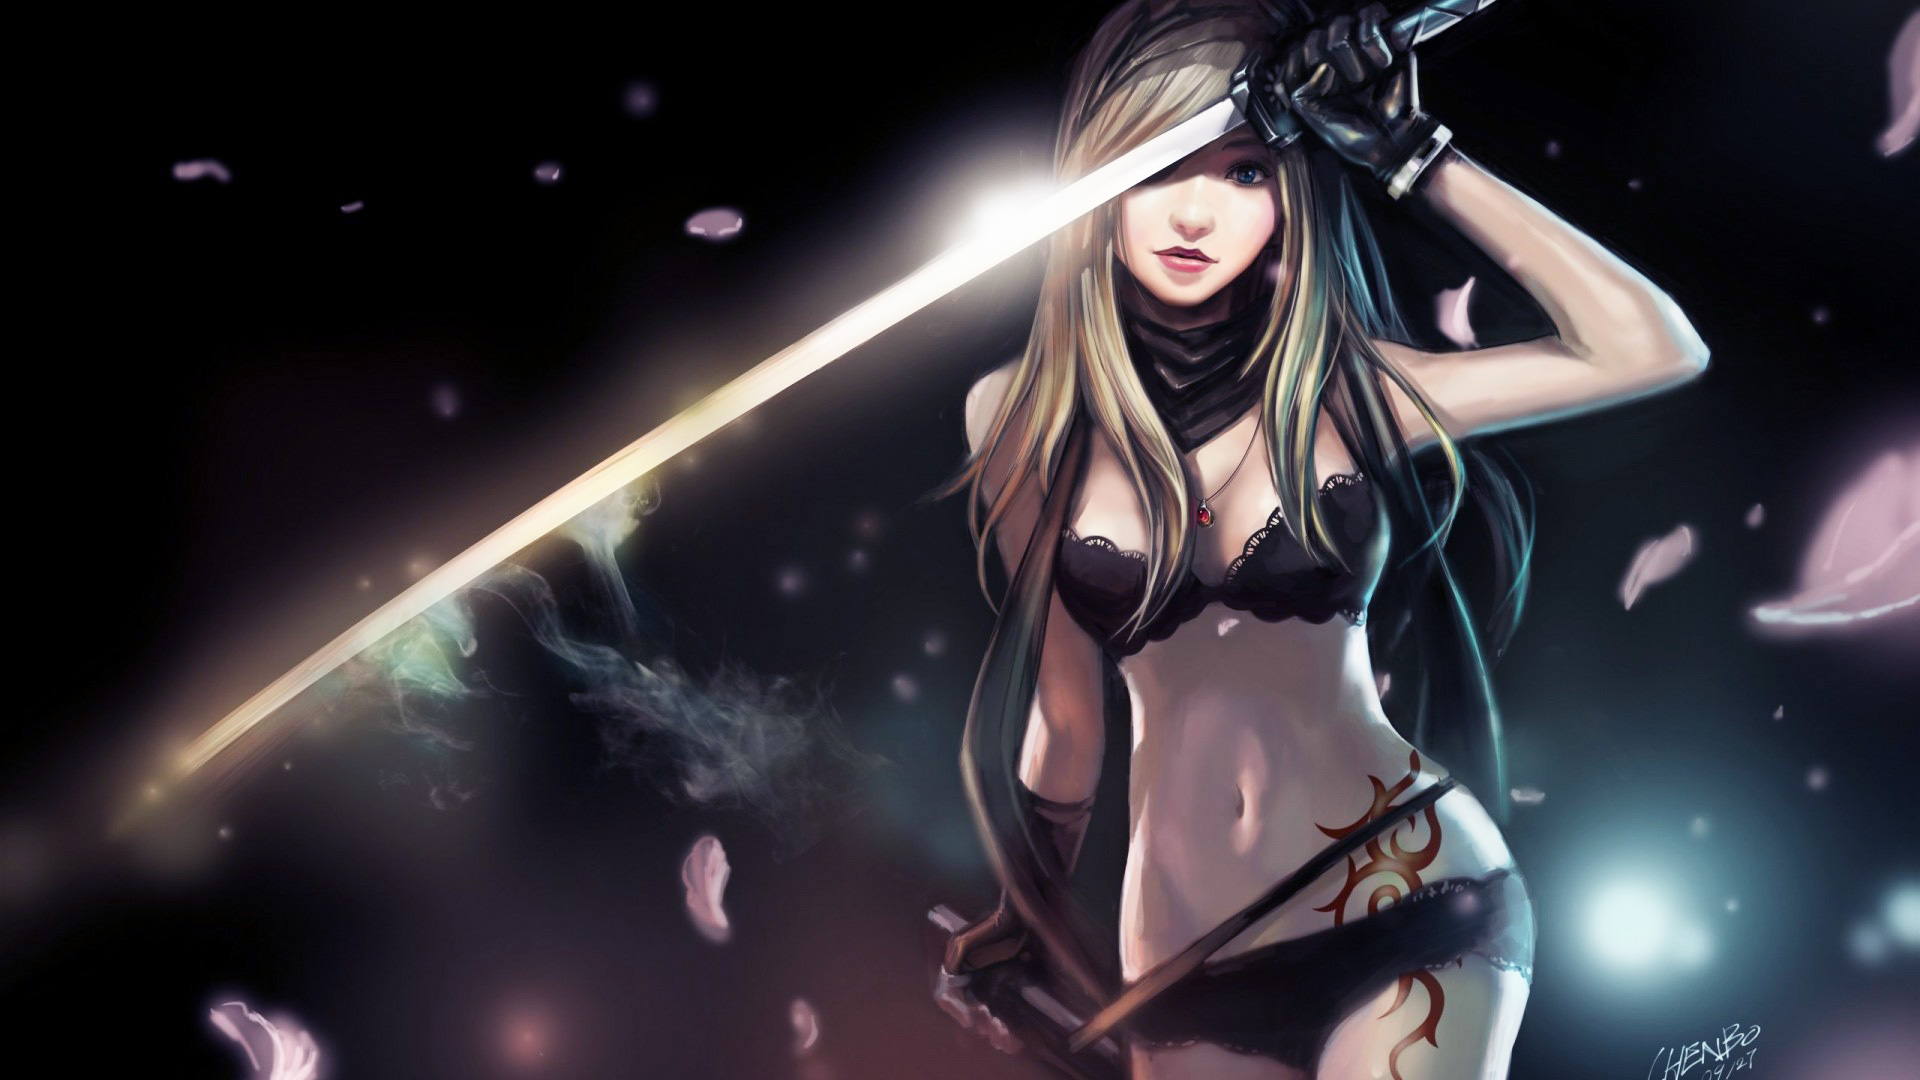 Anime Girl Backgrounds